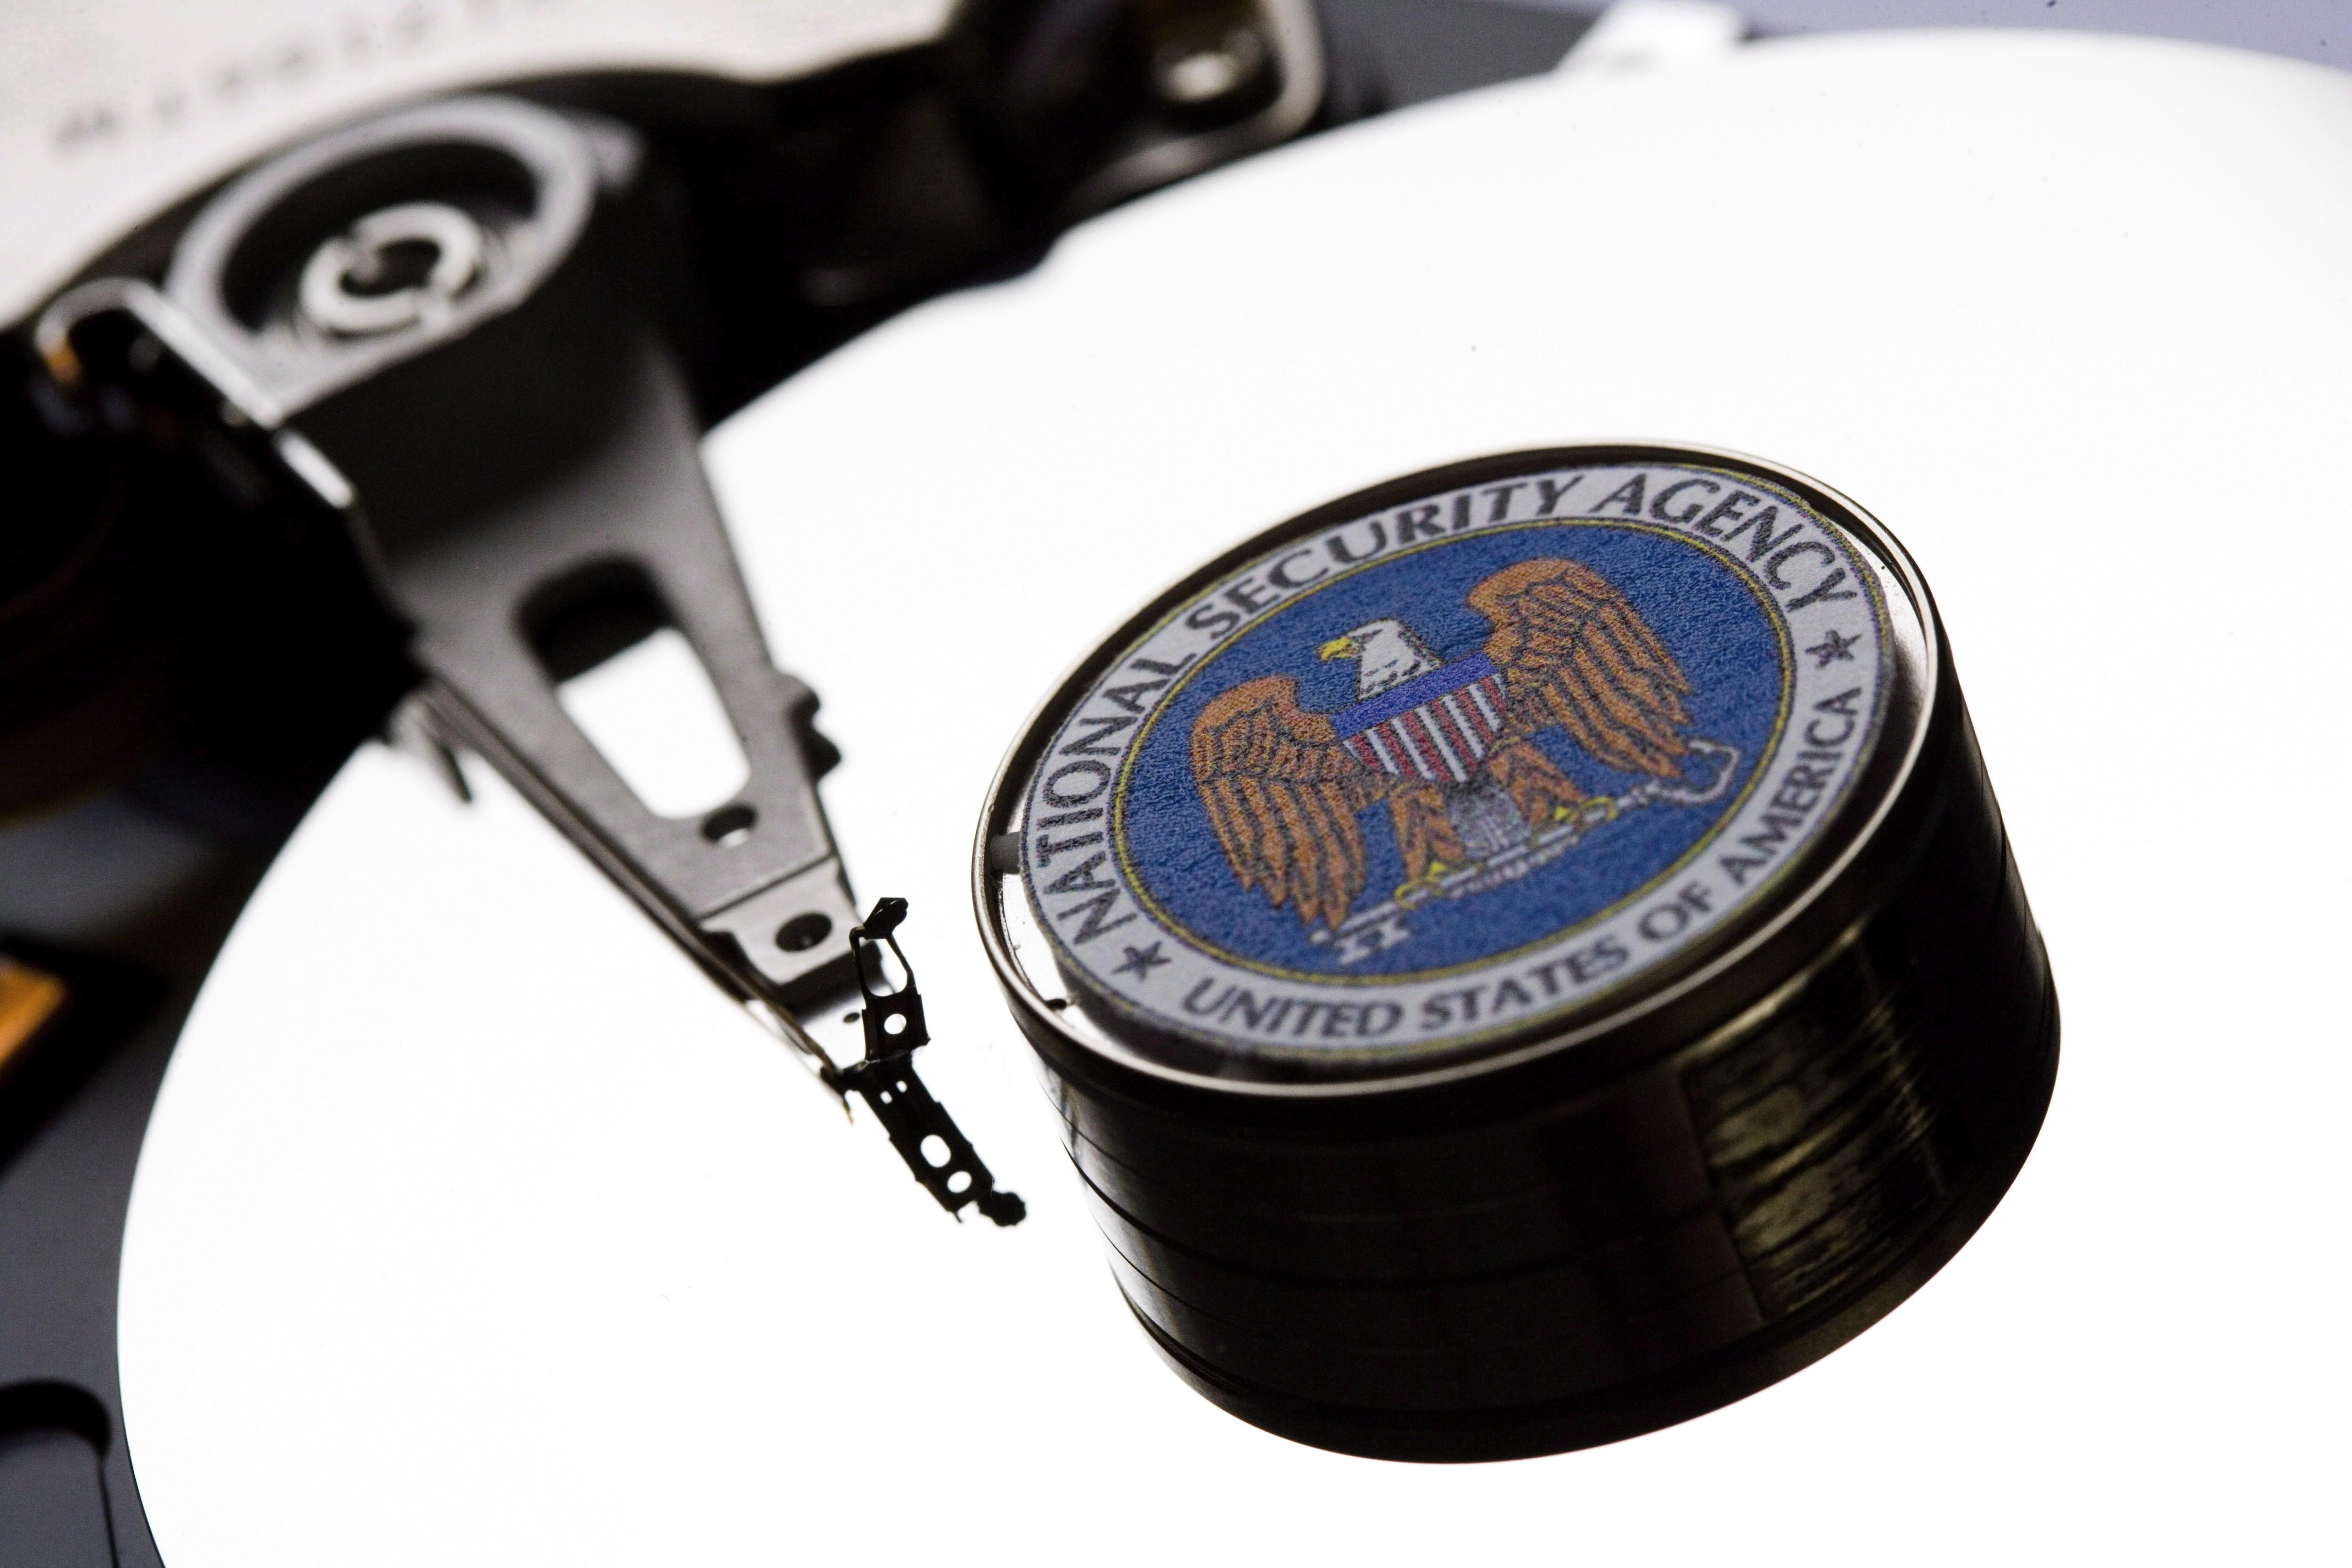 Symbol Photo Computer Hard Drive With NSA Logo.